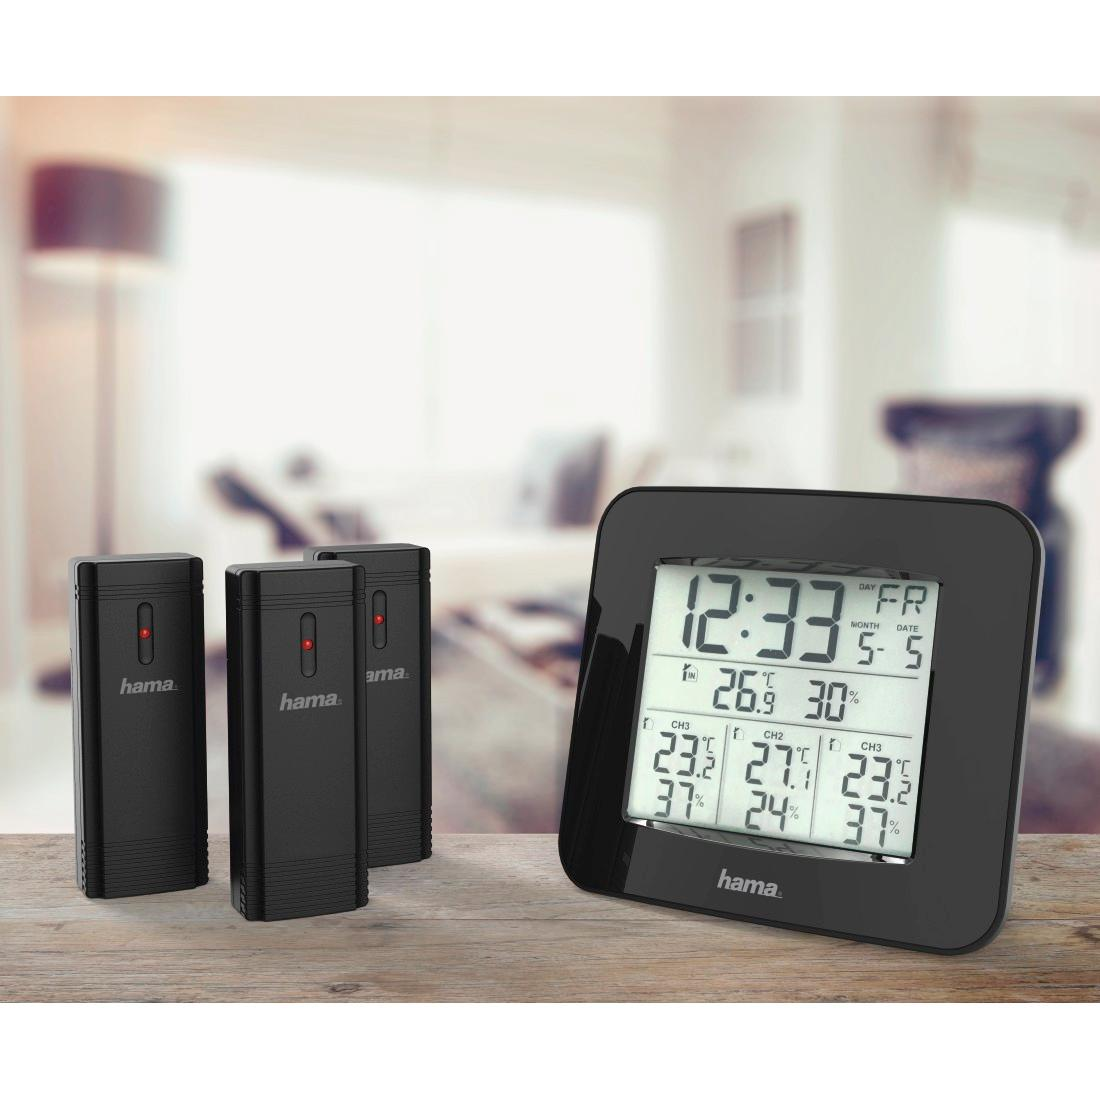 Hama Funk Wetterstation Inkl 3 Au 223 En Sensoren Thermometer Hygrometer Au 223 En 4047443357625 Ebay